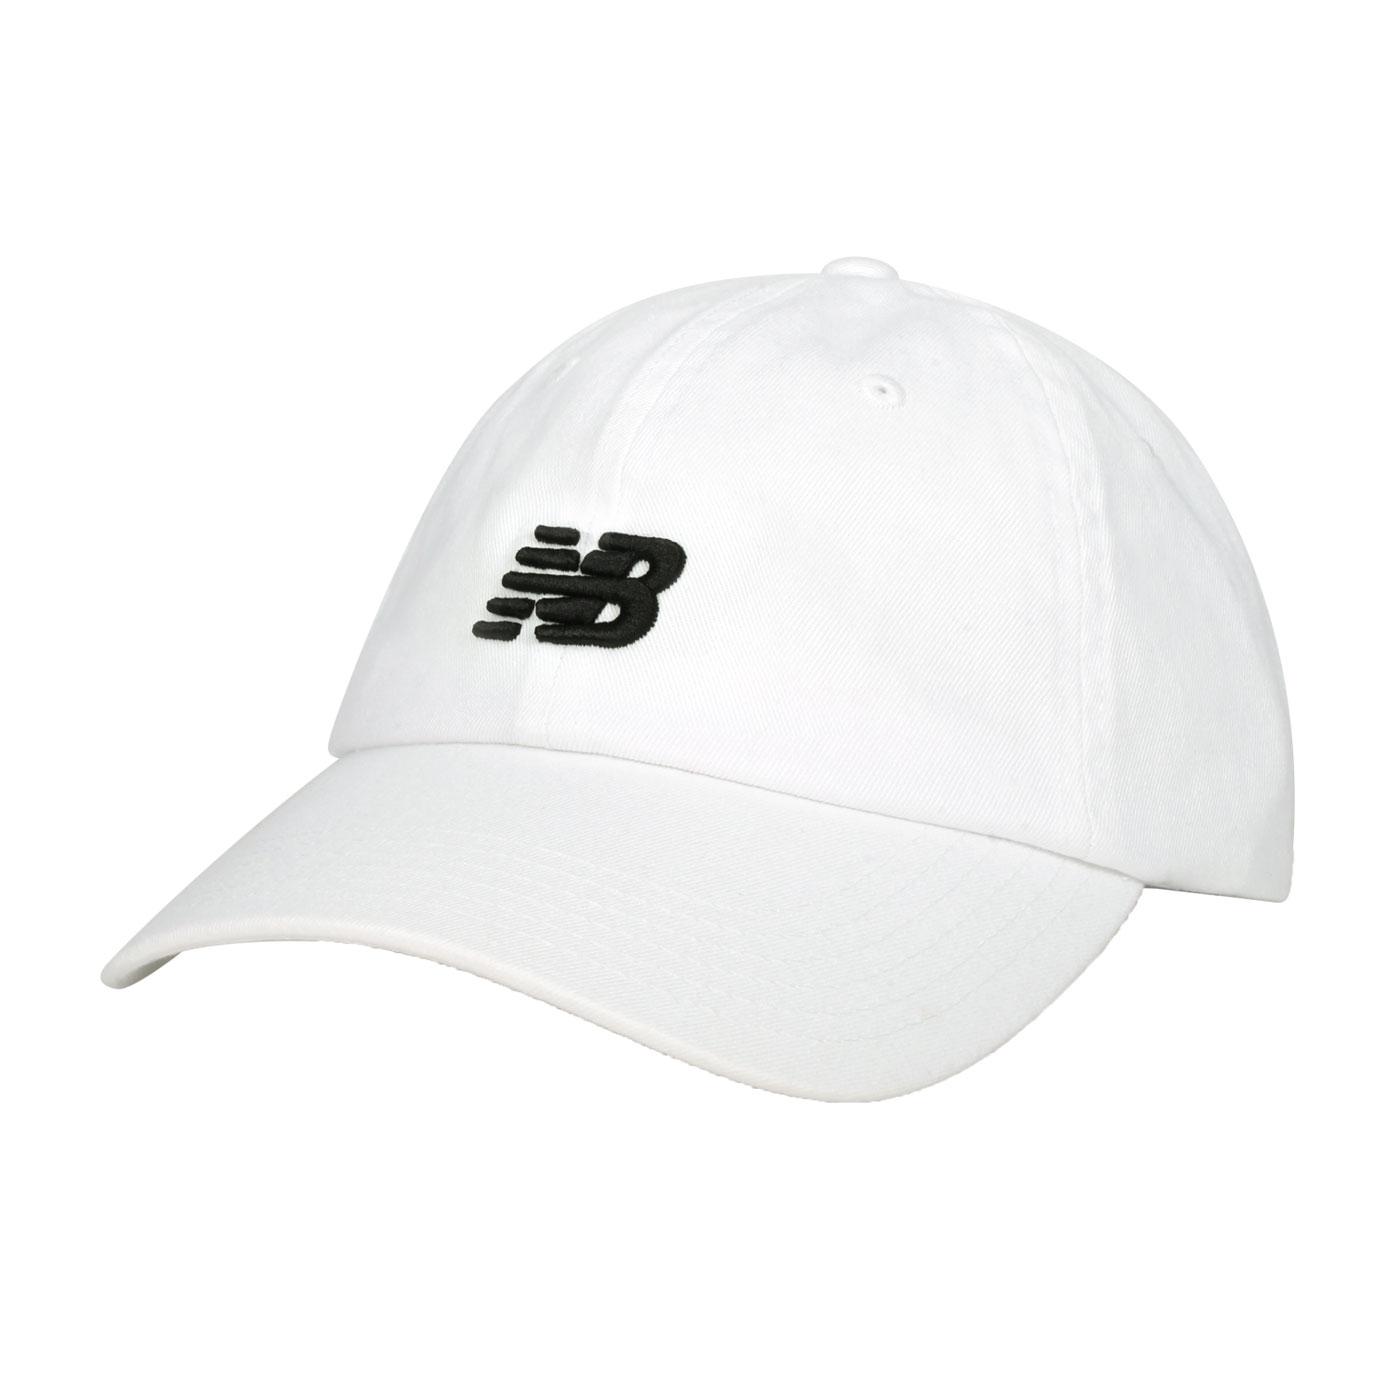 NEW BALANCE 帽子 LAH91014WT - 白黑